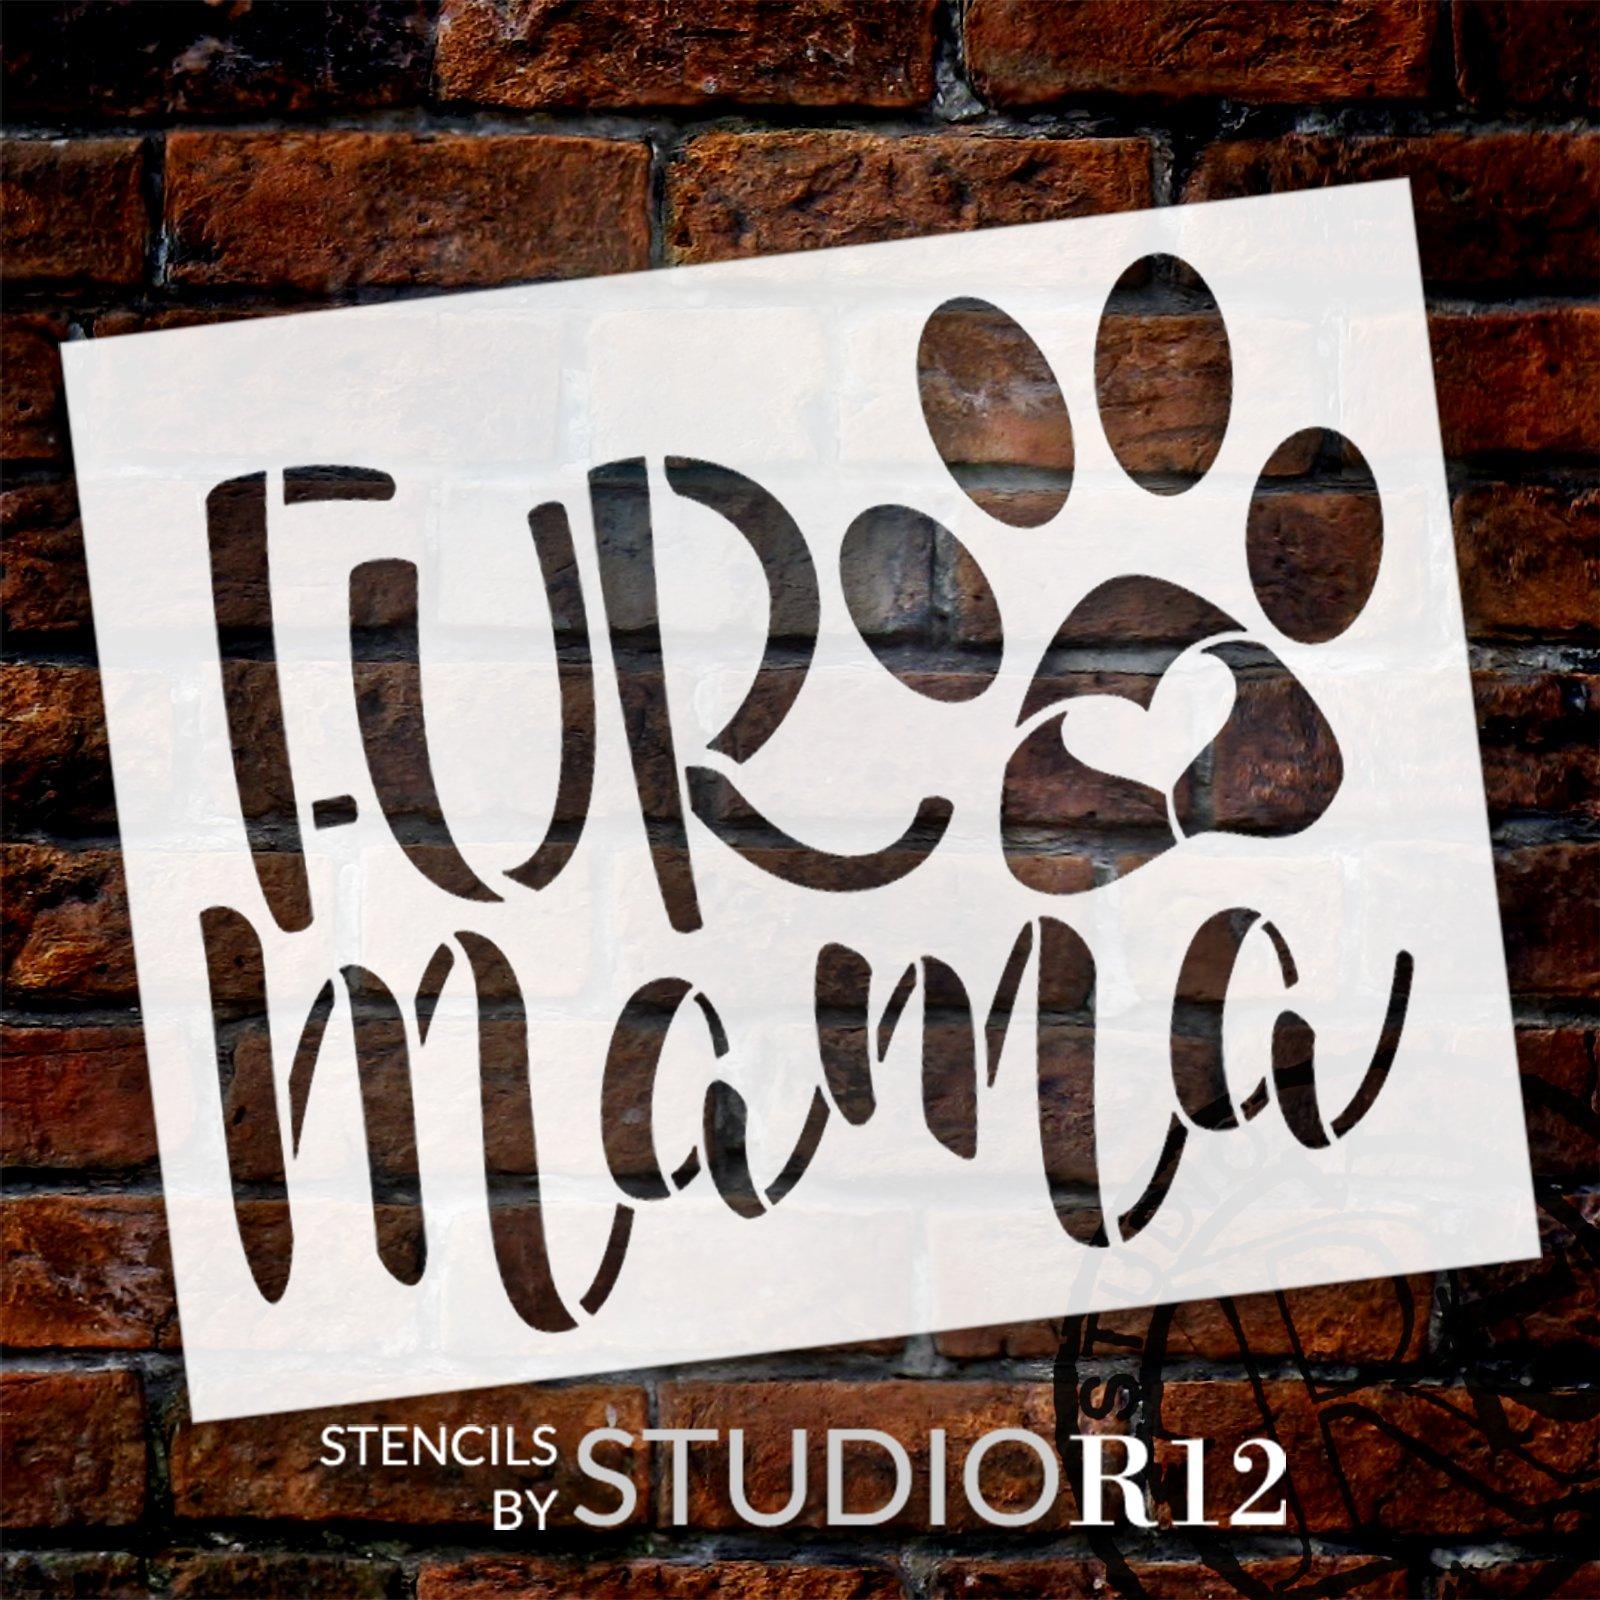 Fur Mama Stencil by StudioR12   Craft DIY Dog & Cat Lover Home Decor   Paint Pet Pawprint Heart Wood Sign   Reusable Mylar Template   Select Size